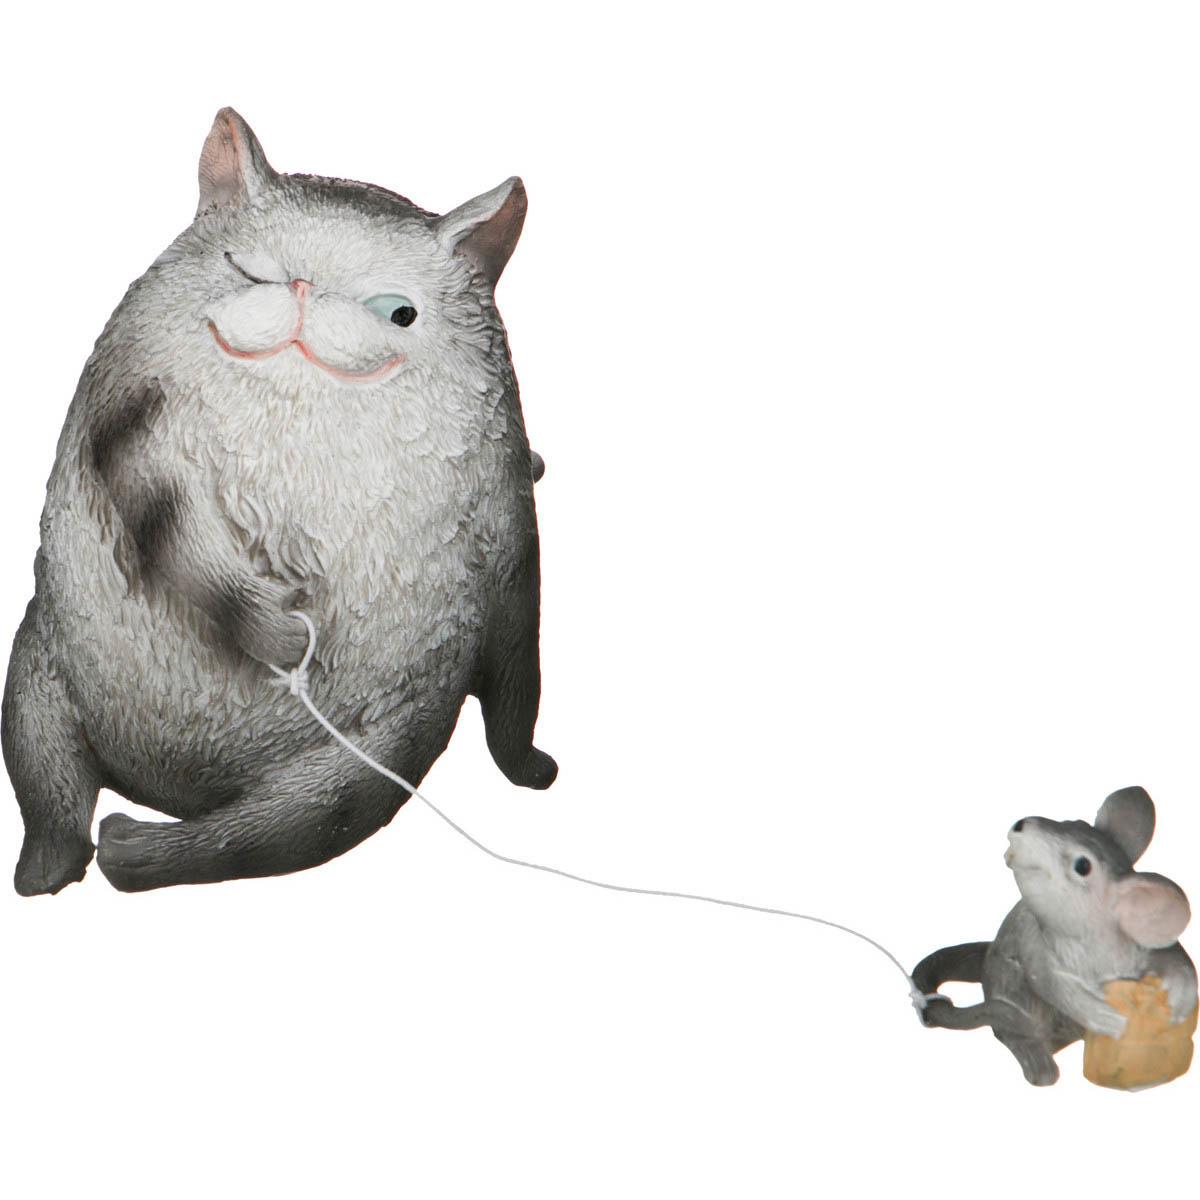 {} WOW collection Фигурка Кошки-Мышки (6х7х8 см) wow wow поющий цыпленок яйцо